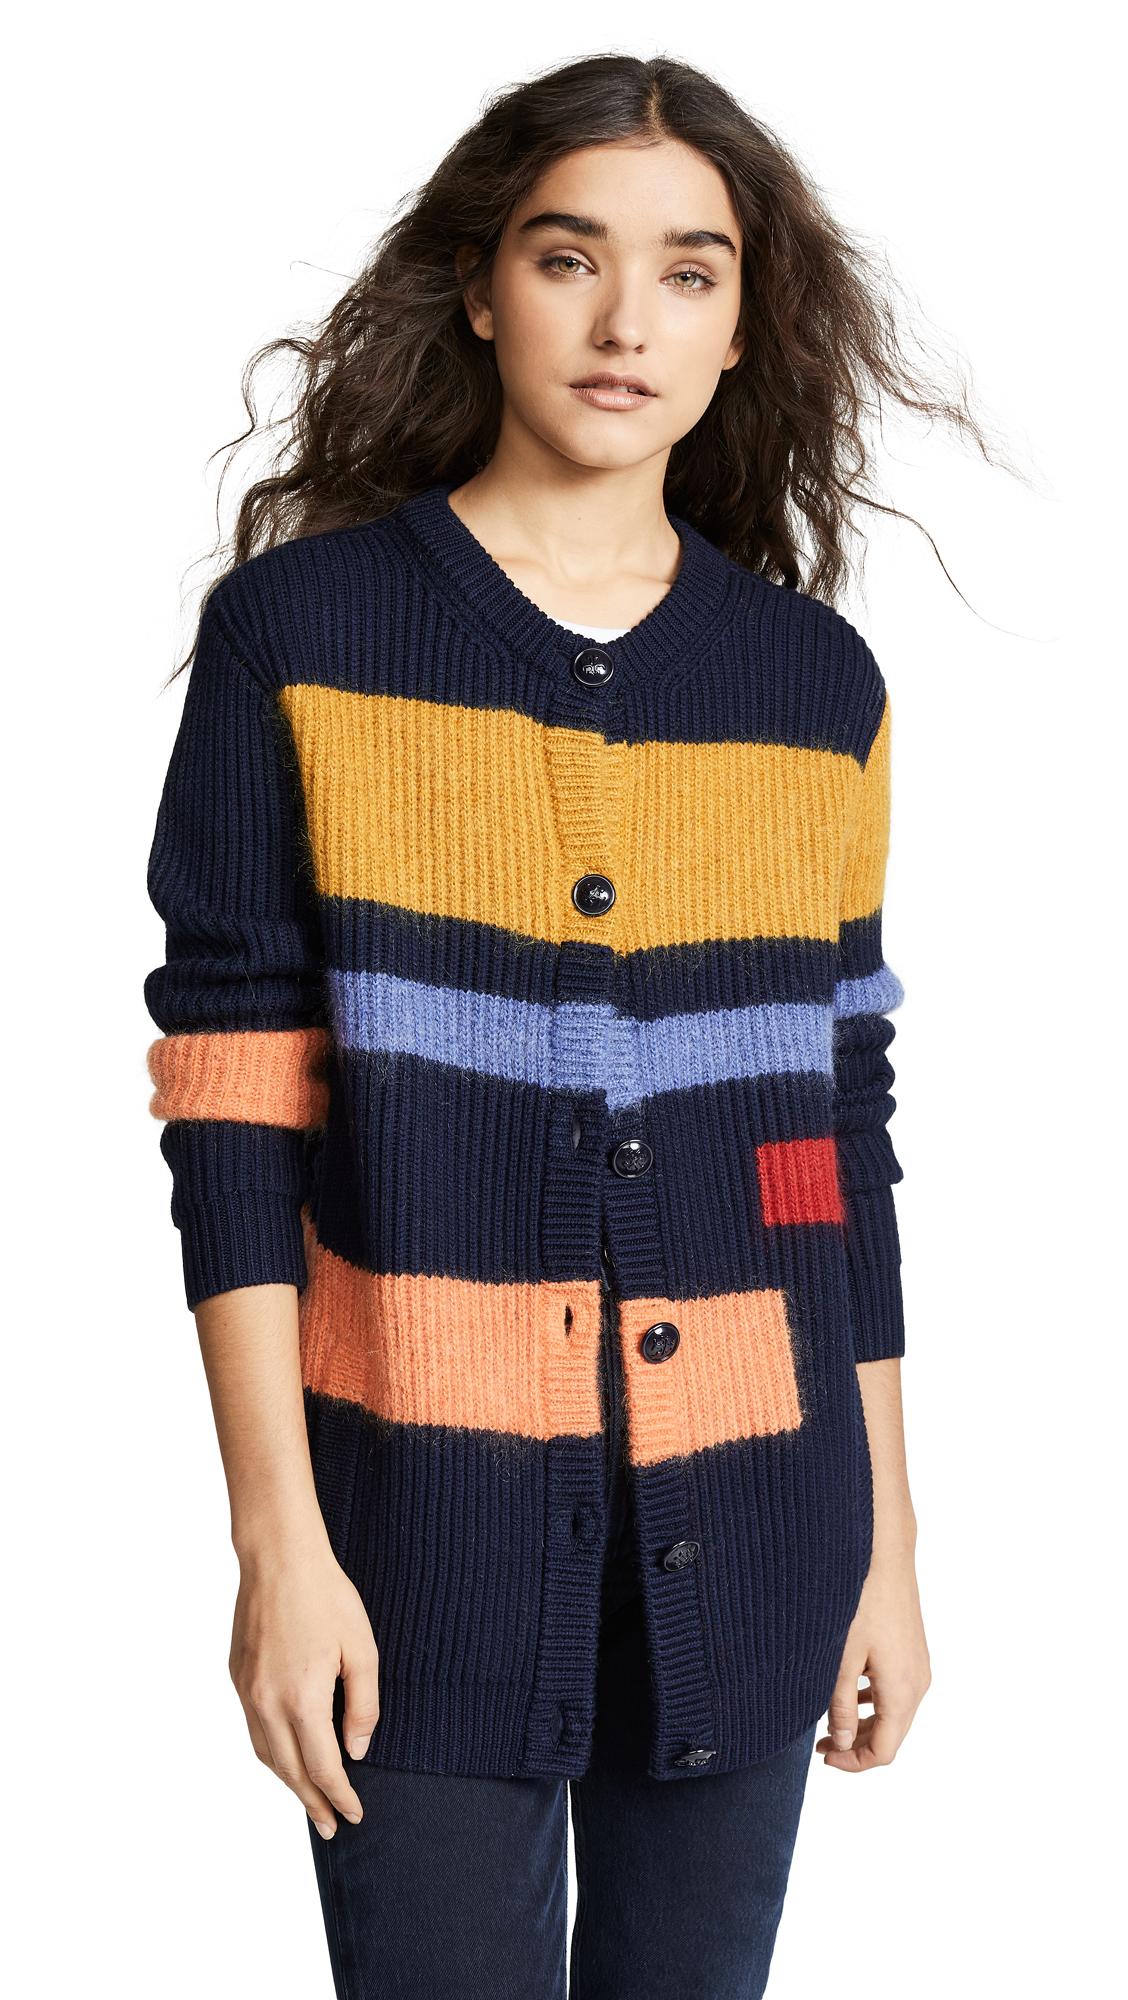 Tory Burch Wool Colorblock Cardigan - Tory Navy